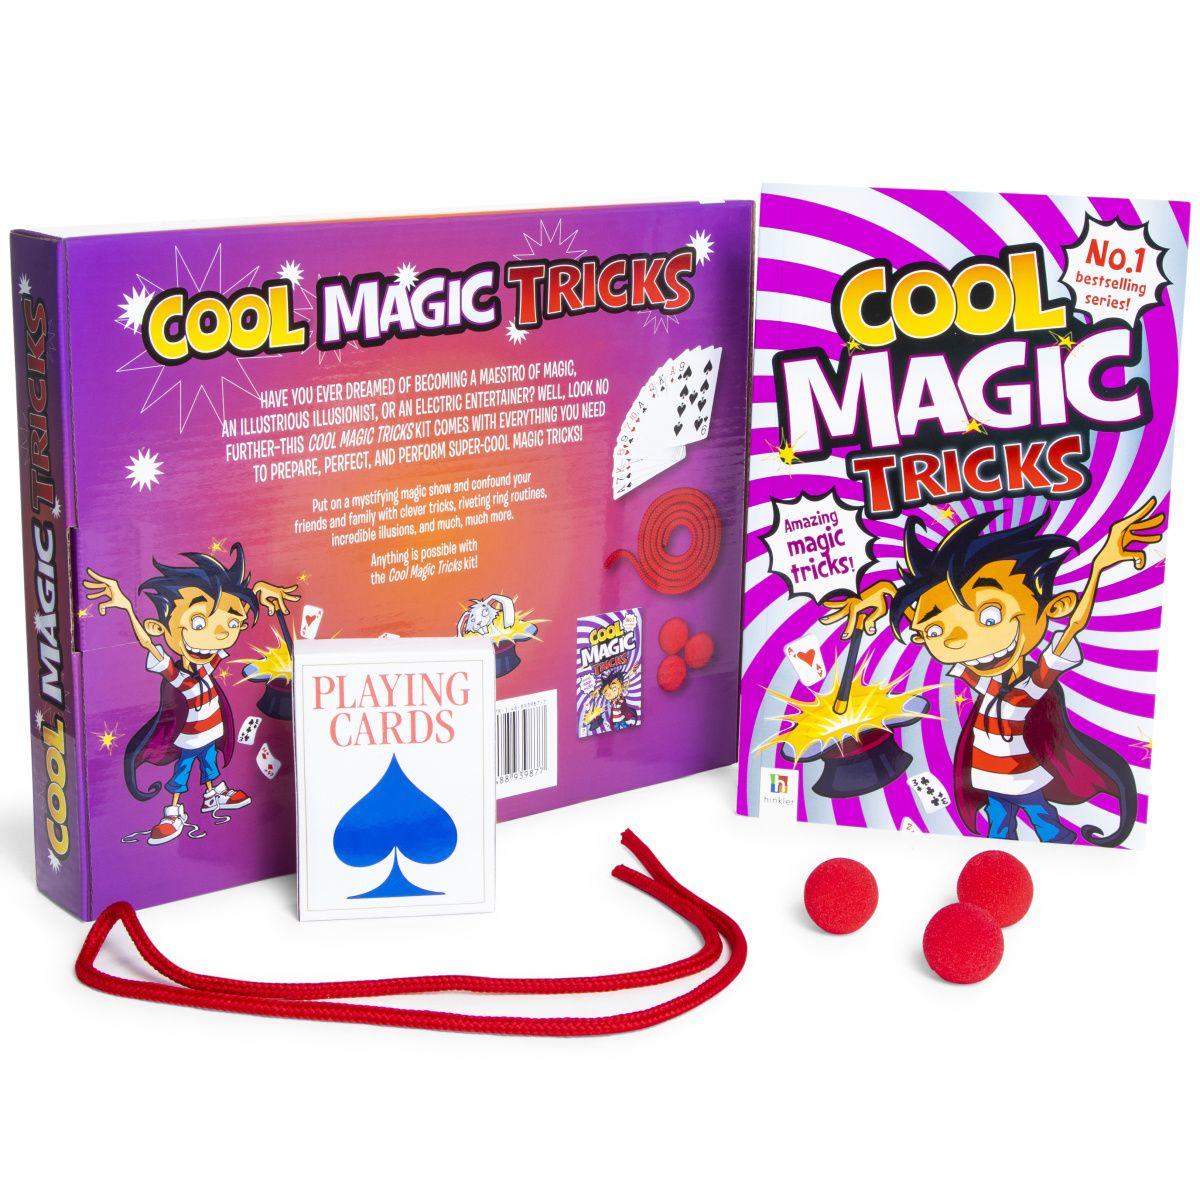 Cool magic tricks book kit in 2020 cool magic tricks